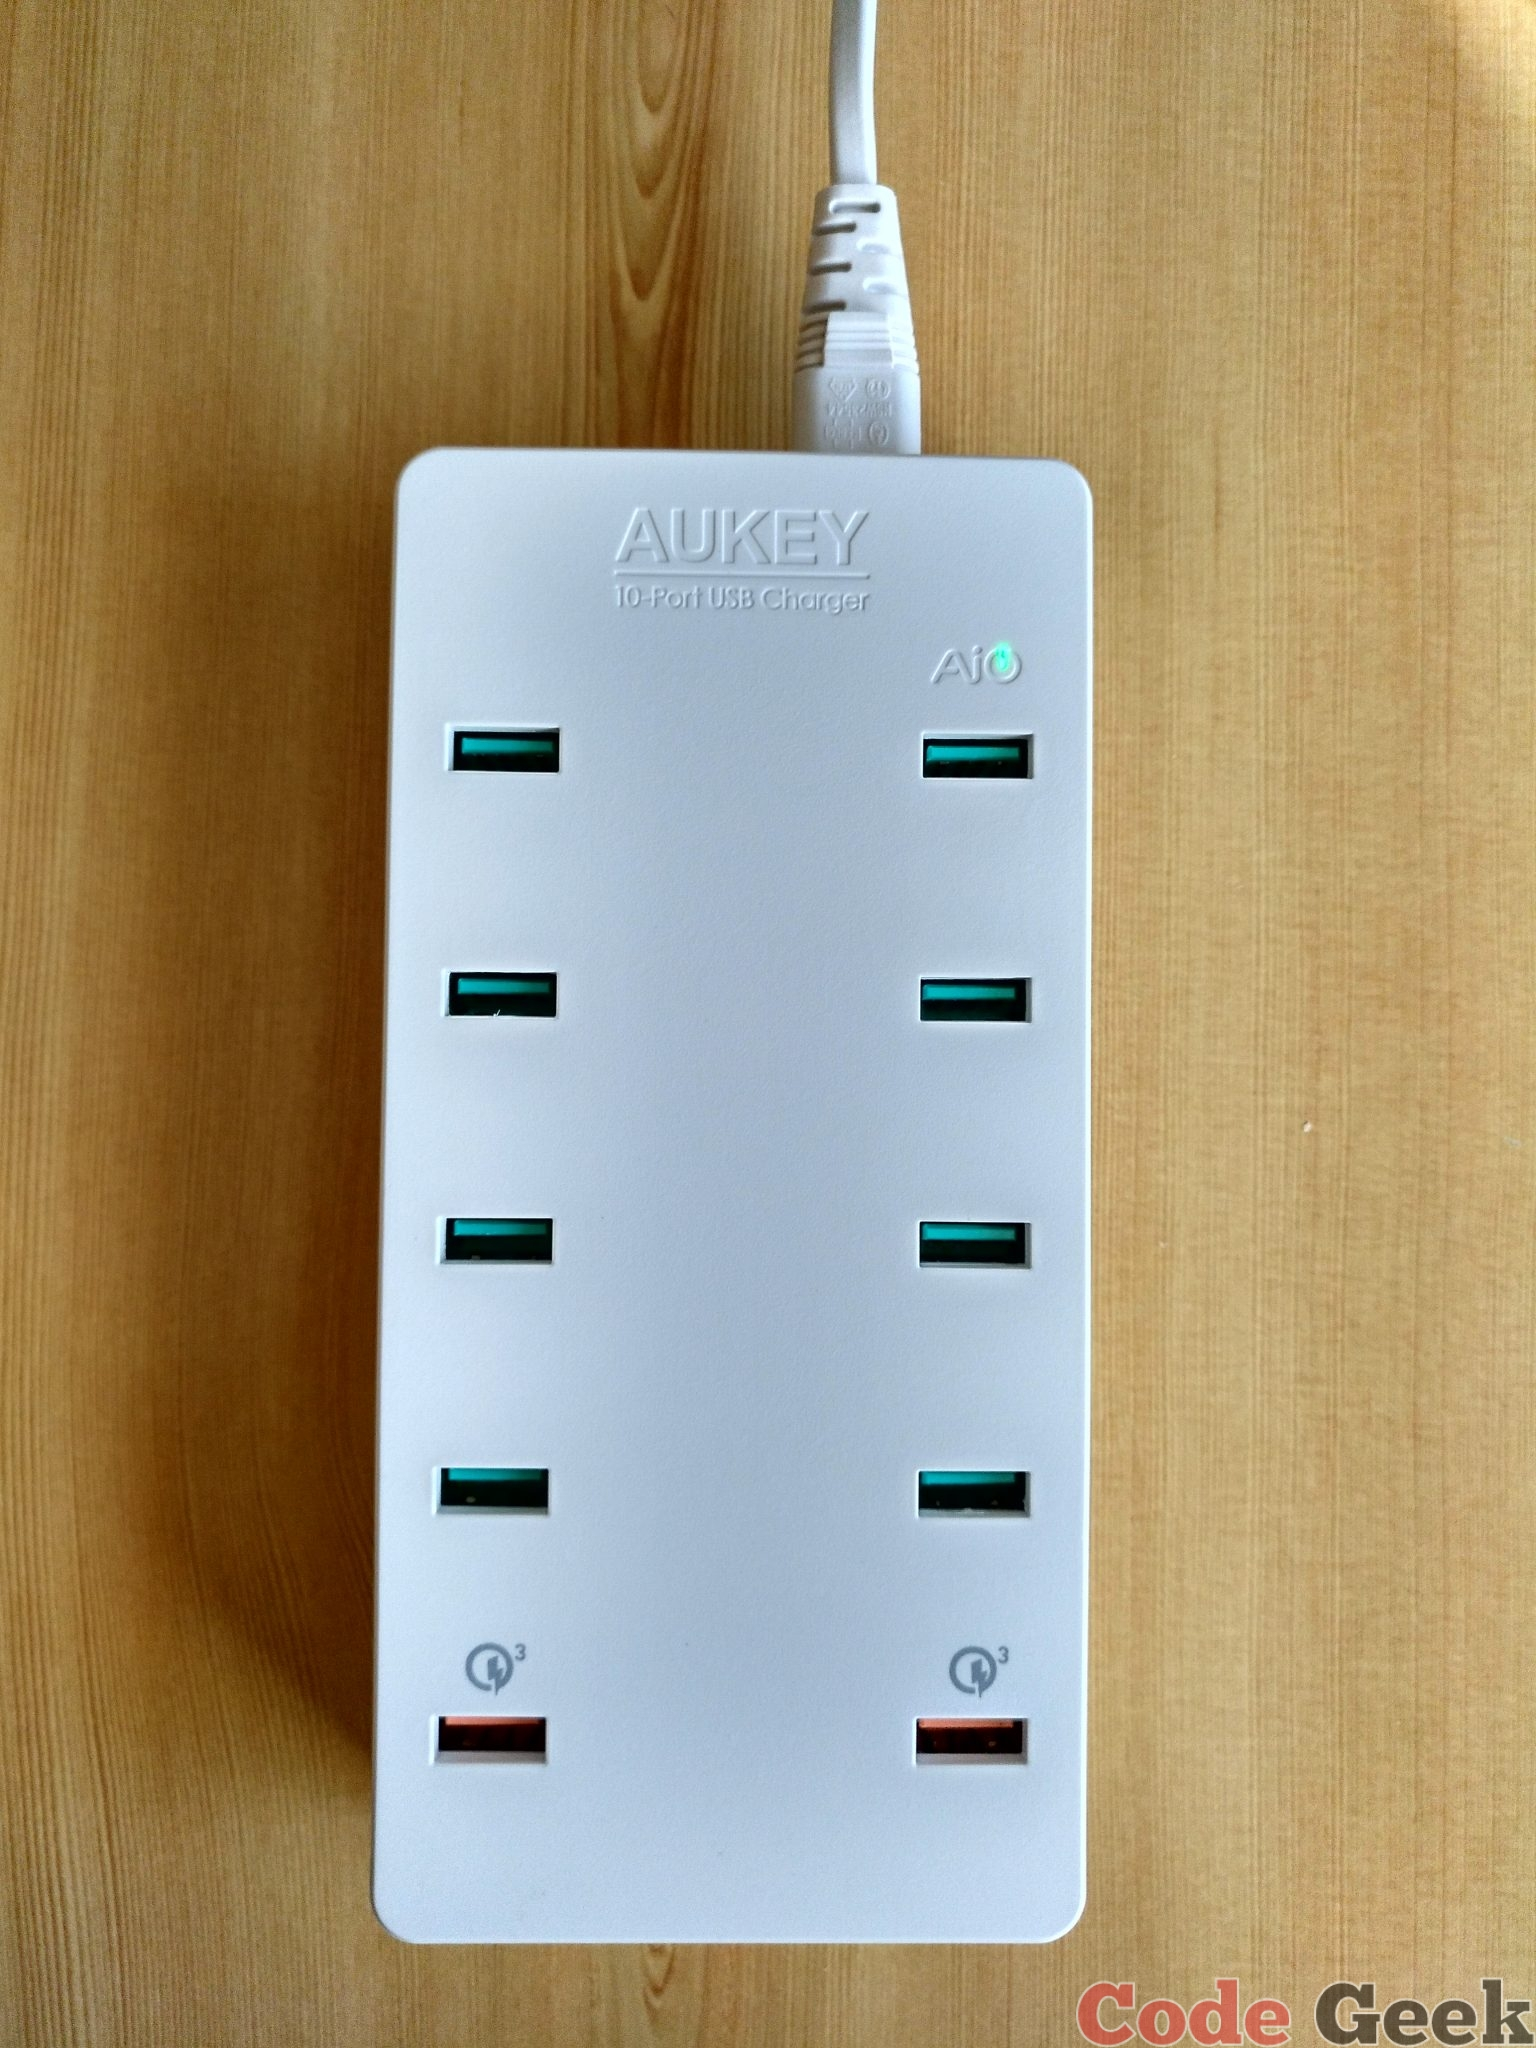 AUKEY - PA-T8 - Cargador Quick Charge 3.0 con 10 puertos USB